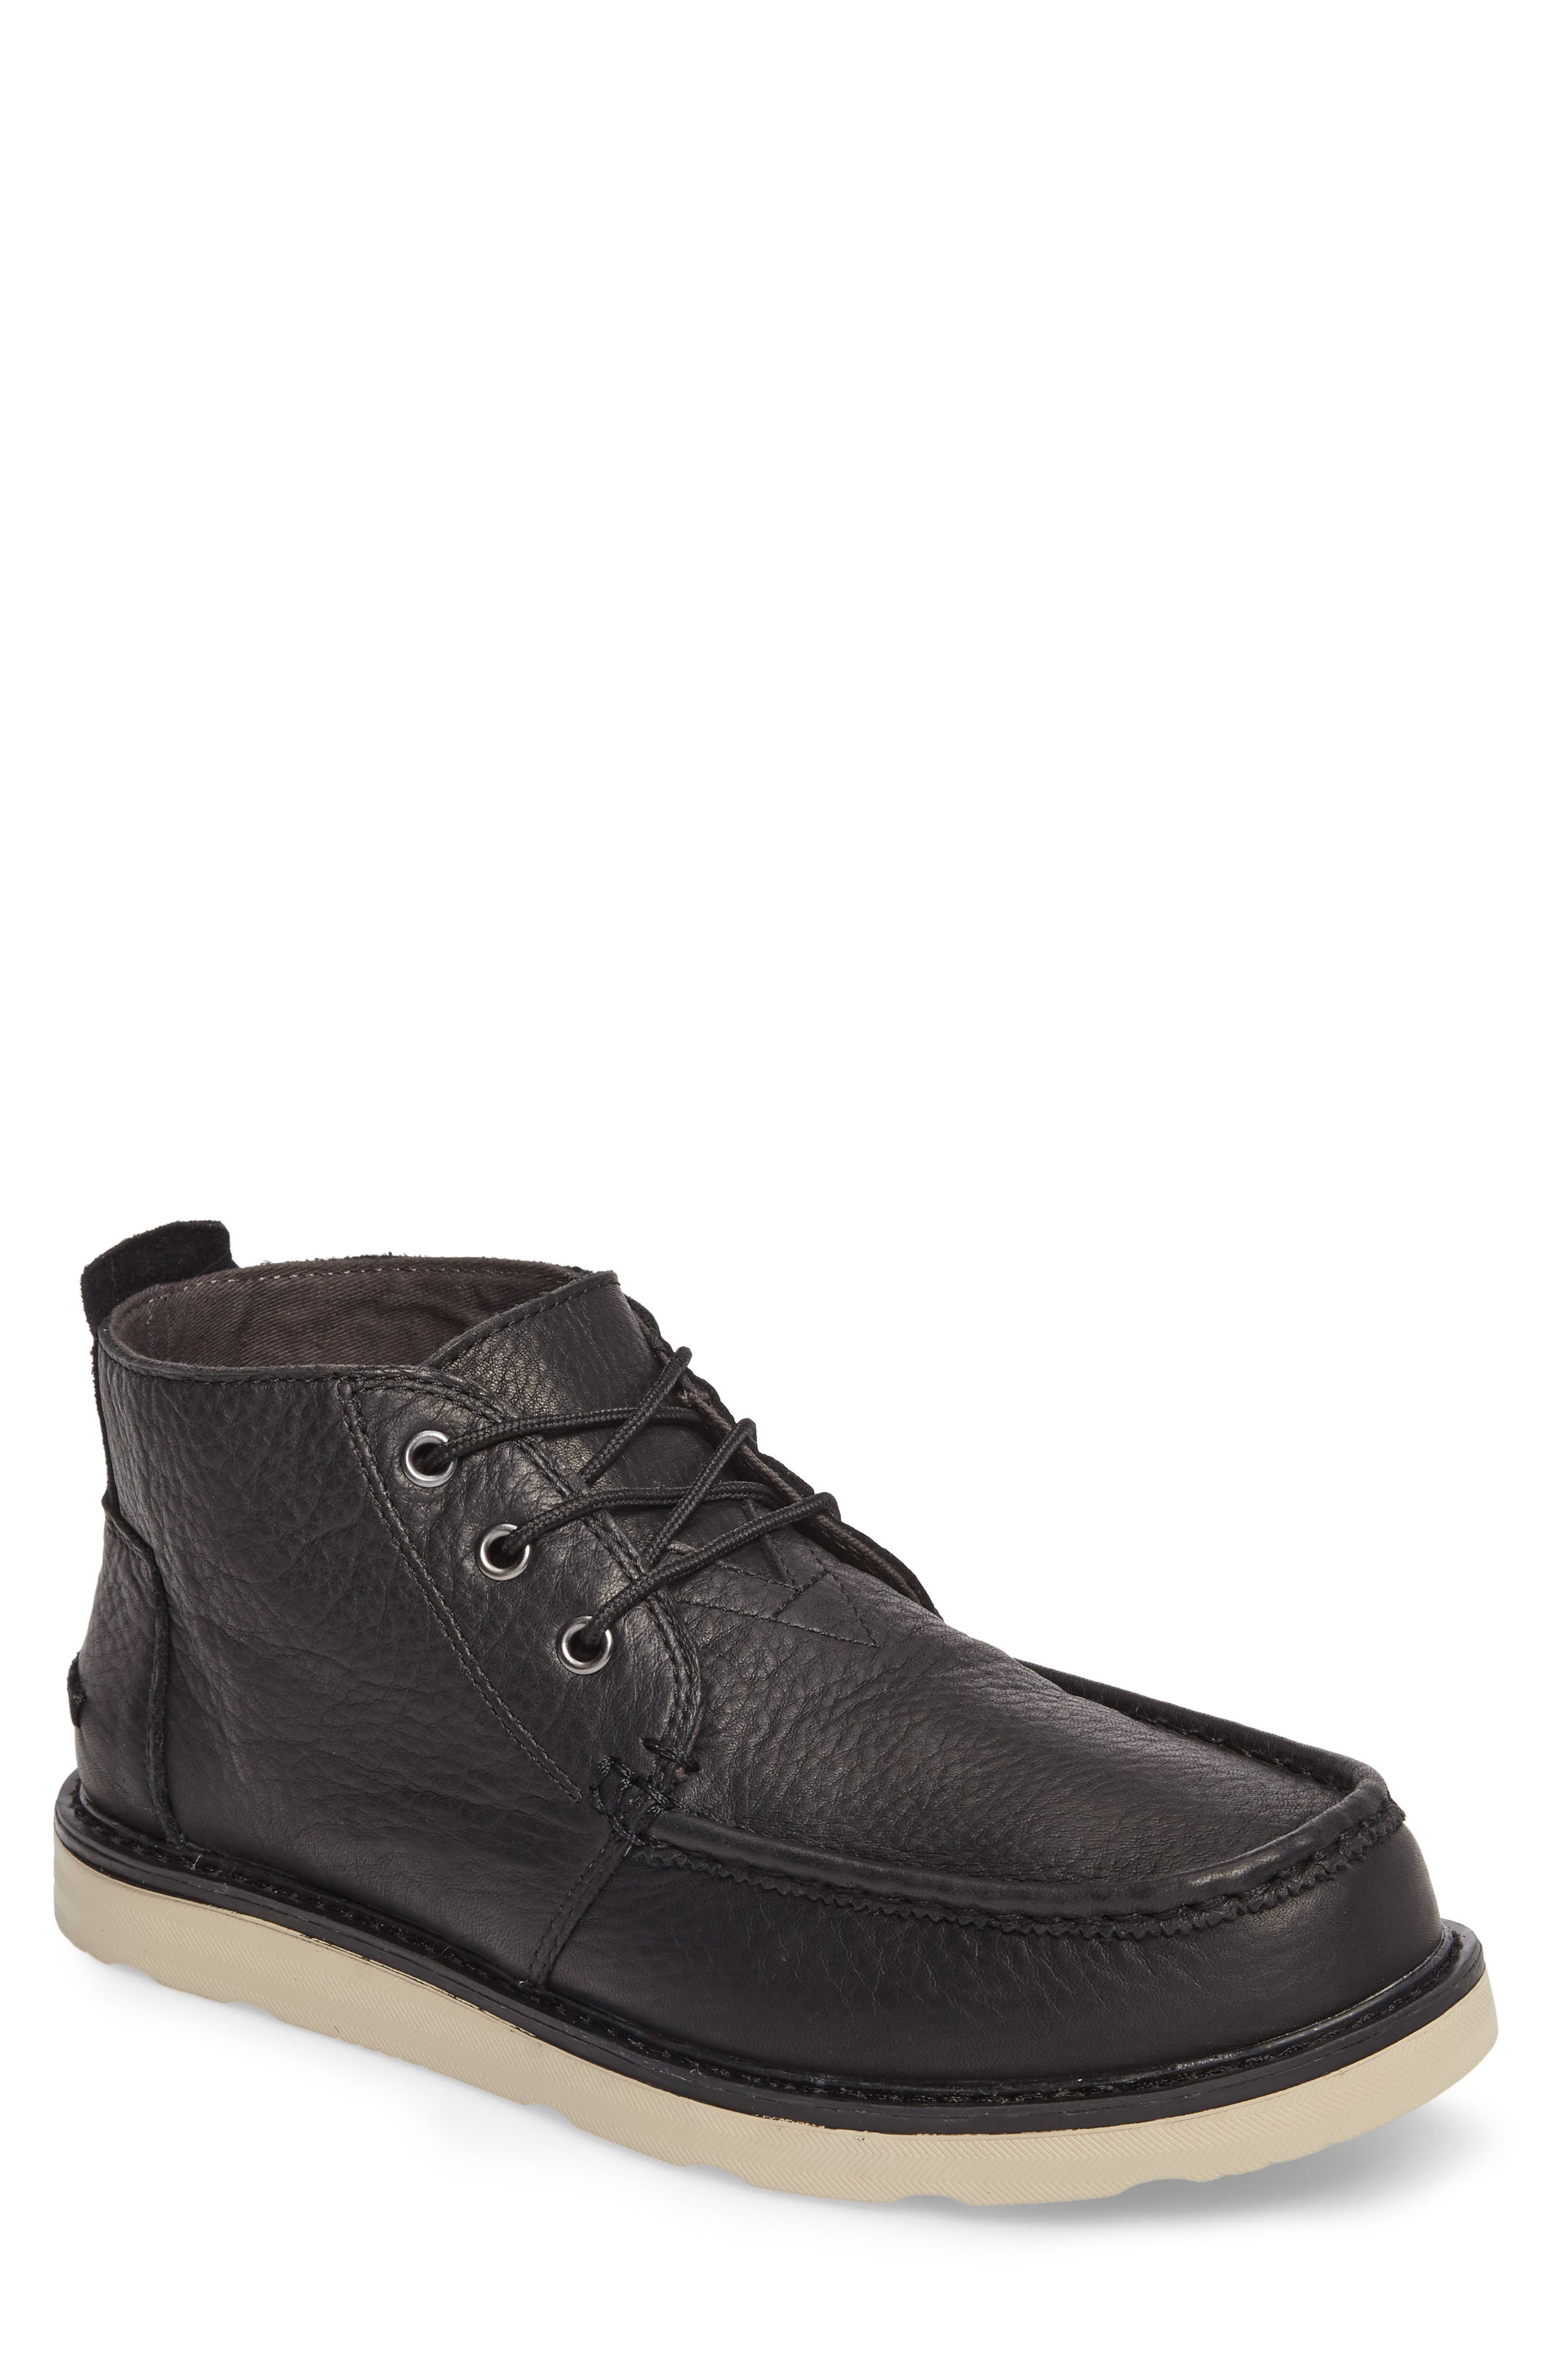 Chukka Boot,                             Main thumbnail 1, color,                             Black/Black Leather